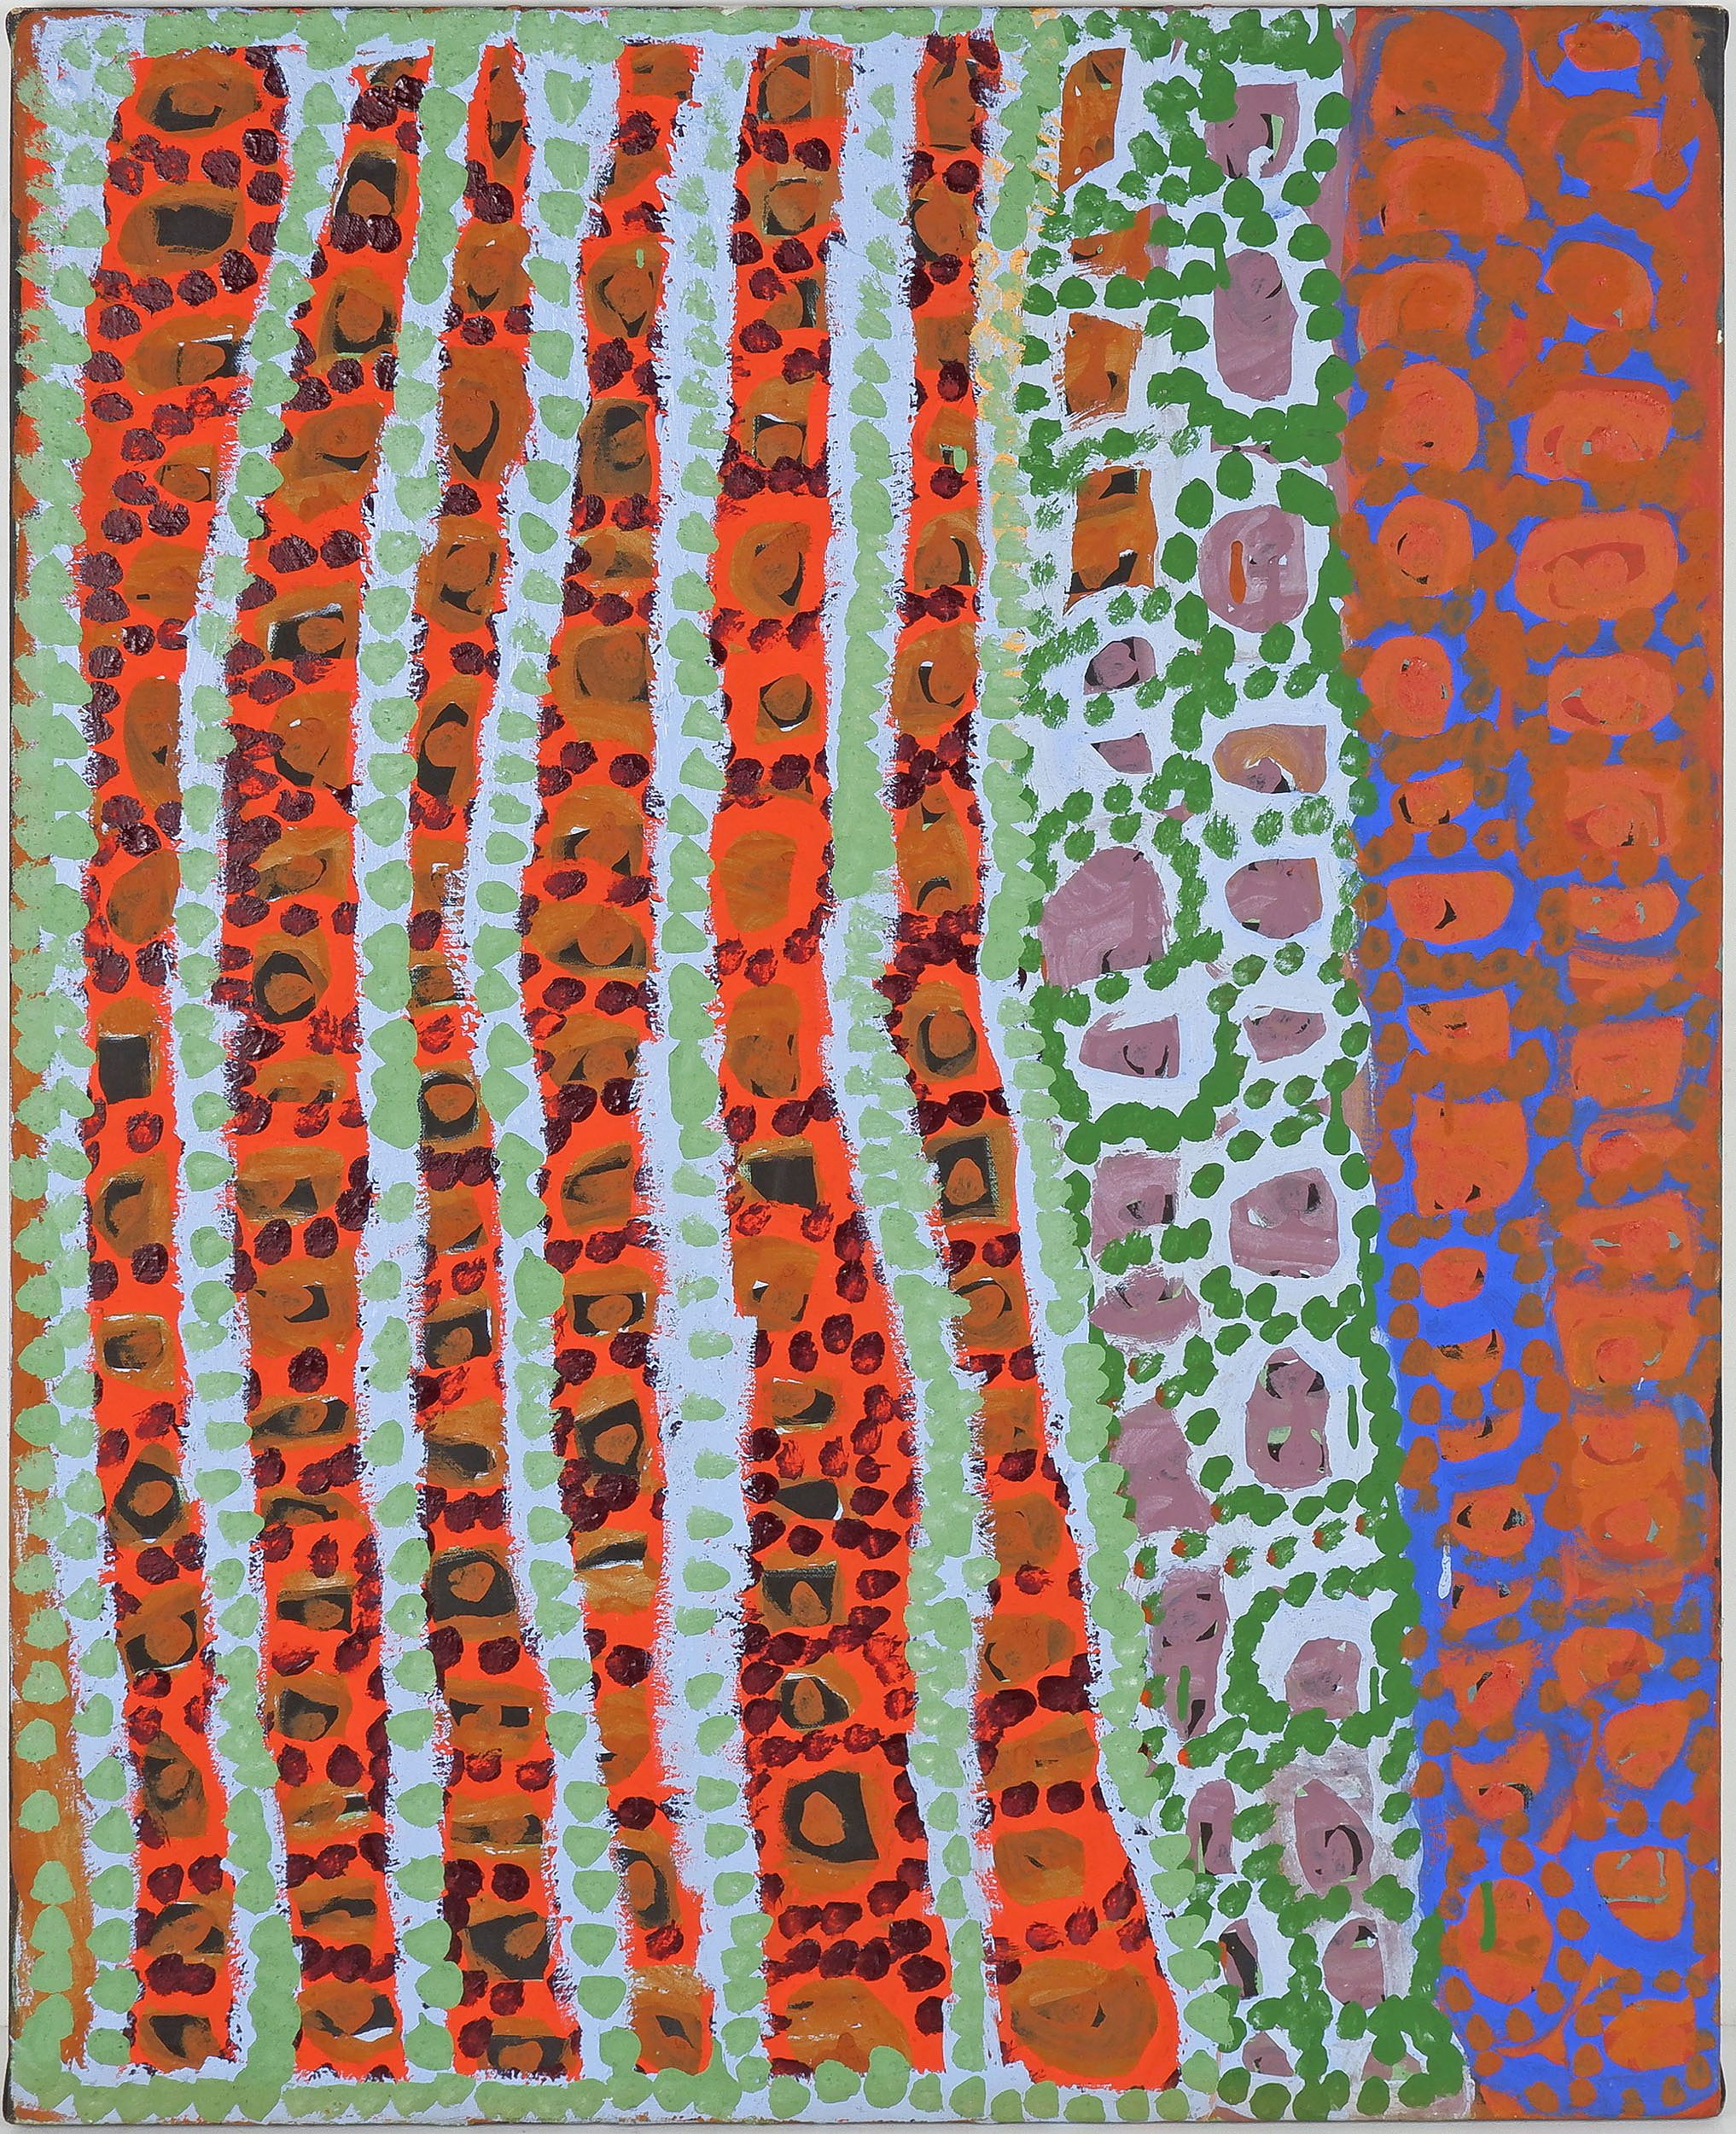 'Sally Liki Nanii (c.1932-) Kirriwirri, Acrylic on Canvas'